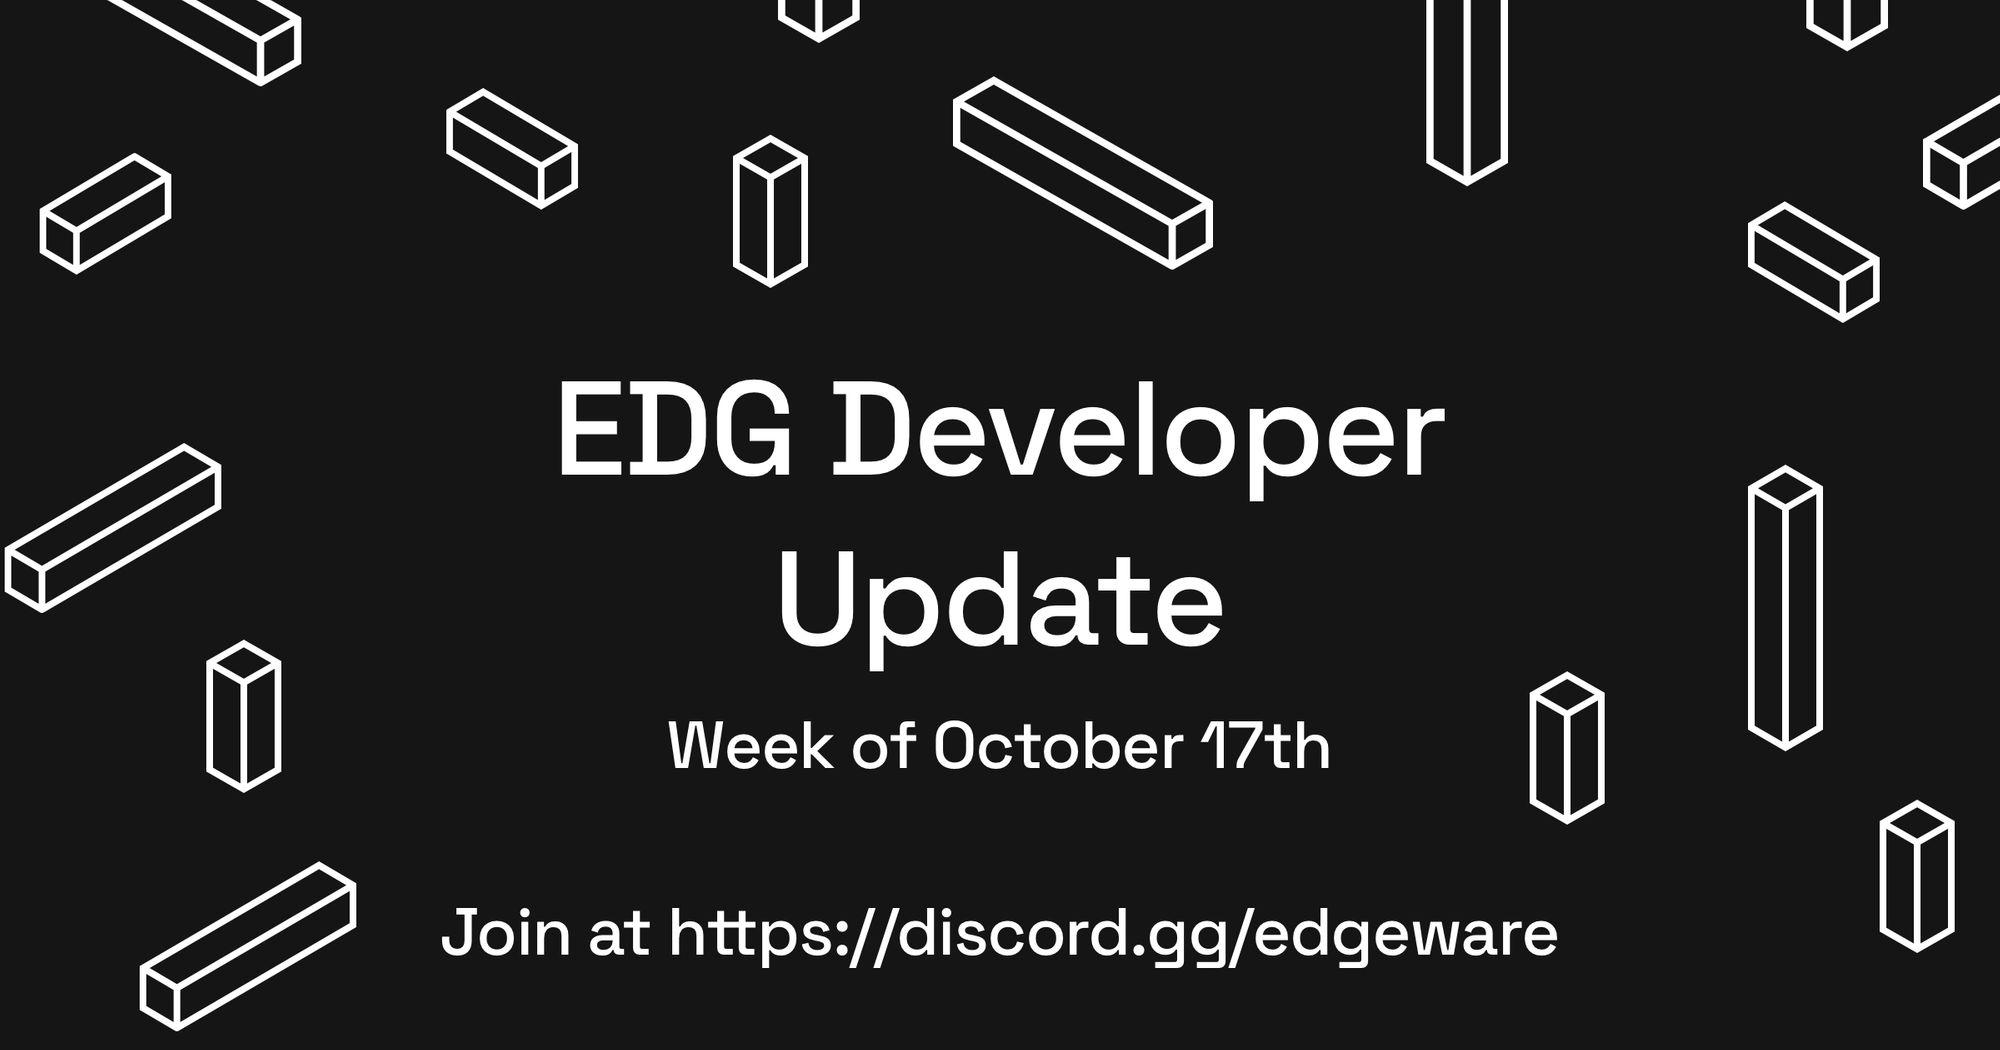 EDG Developer Update: Oct 10 - Oct 16 2021